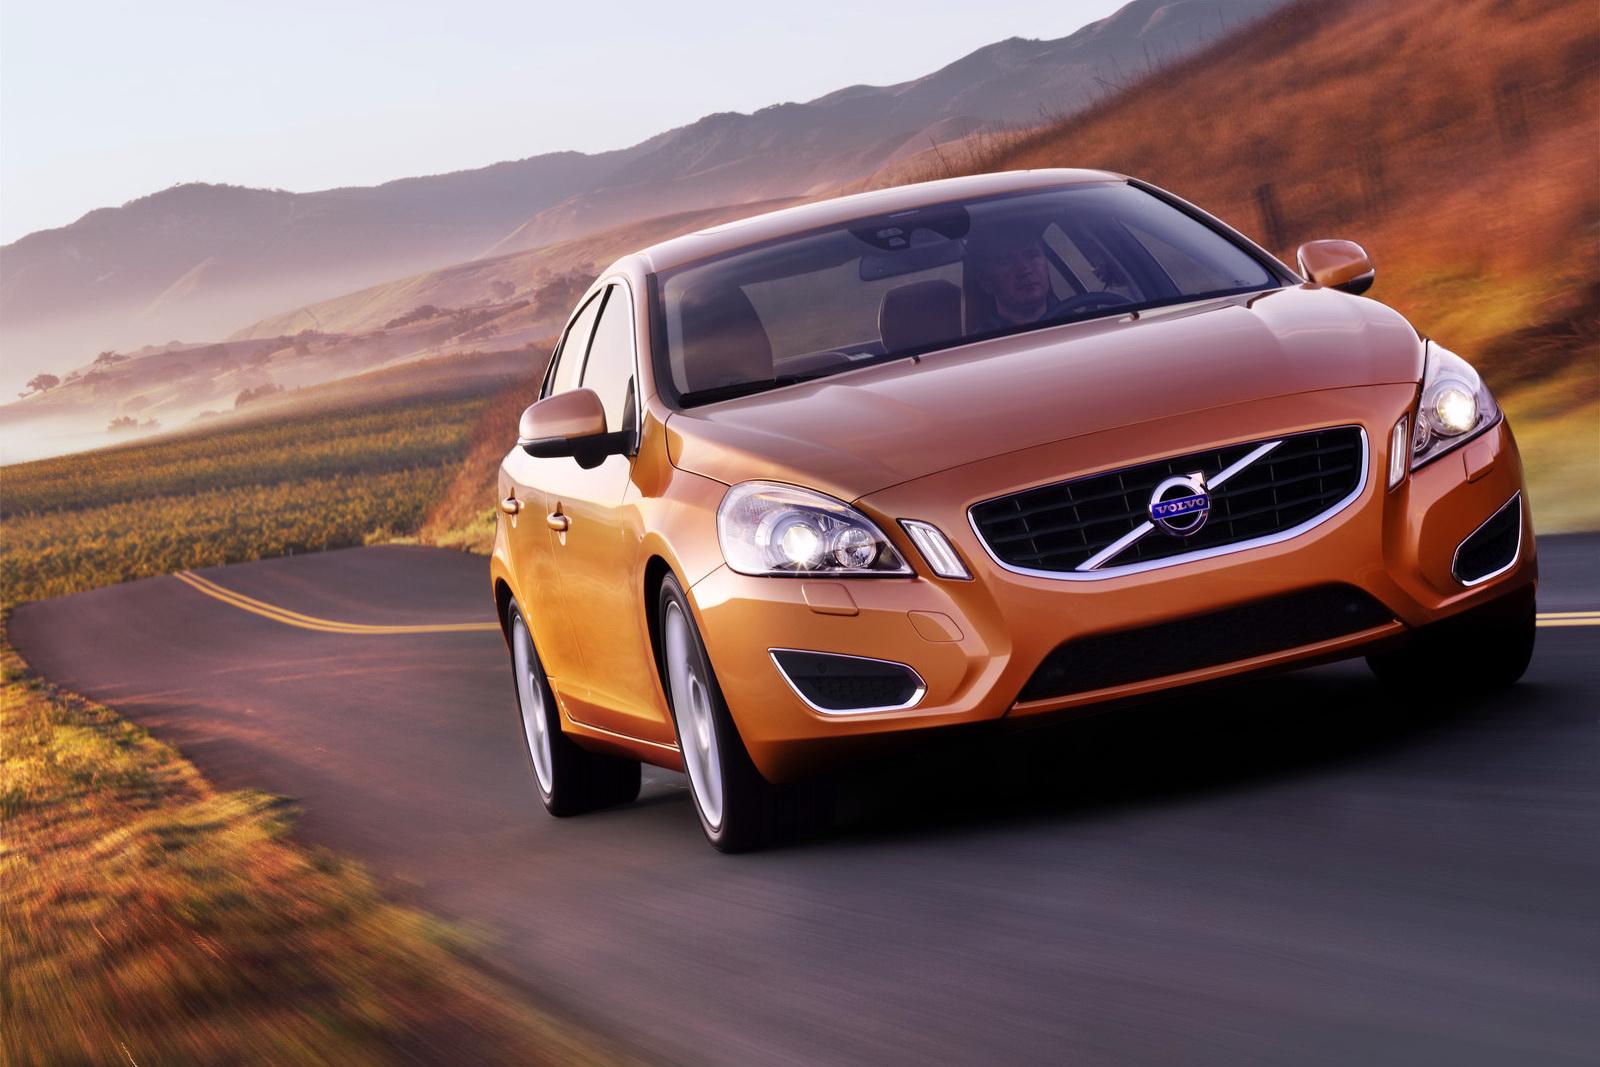 http://3.bp.blogspot.com/-USYiYShjliA/Tok6x4cMJ4I/AAAAAAAAAqo/RFEvrYyWOM8/s1600/2011+Volvo+S60+wallpaper+-+3.JPG